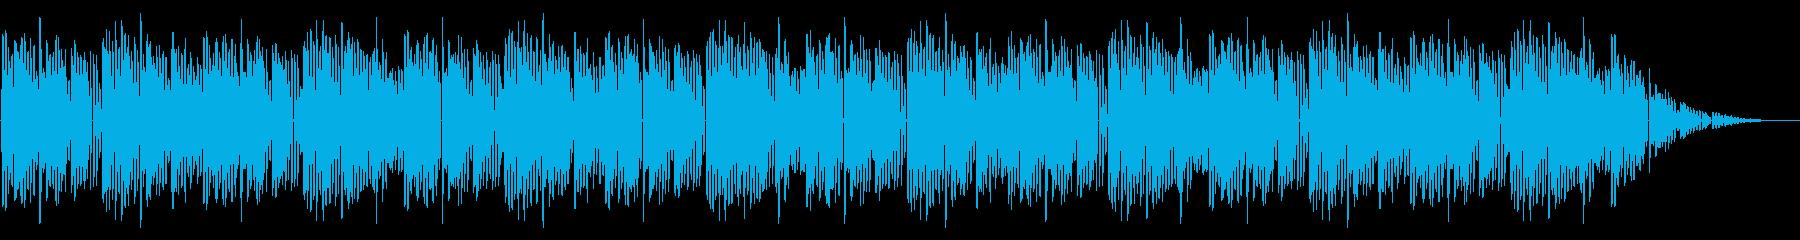 GB風対戦格闘ゲームのED曲の再生済みの波形